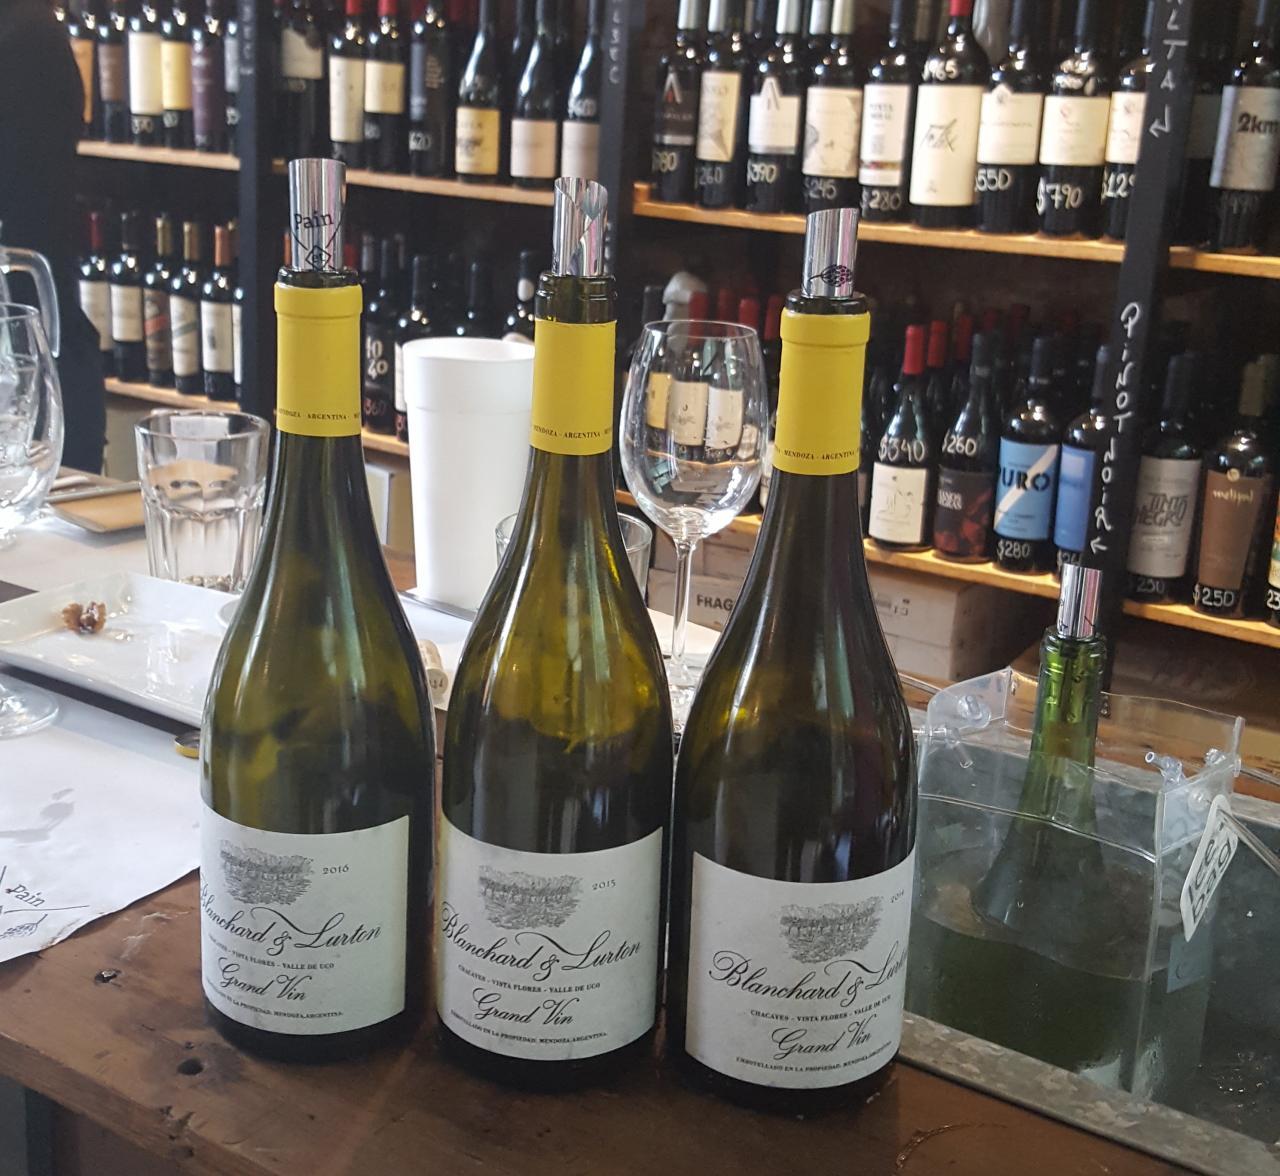 Vertical de Blanchard & Lurton Grand Vin 2014/2015/2016